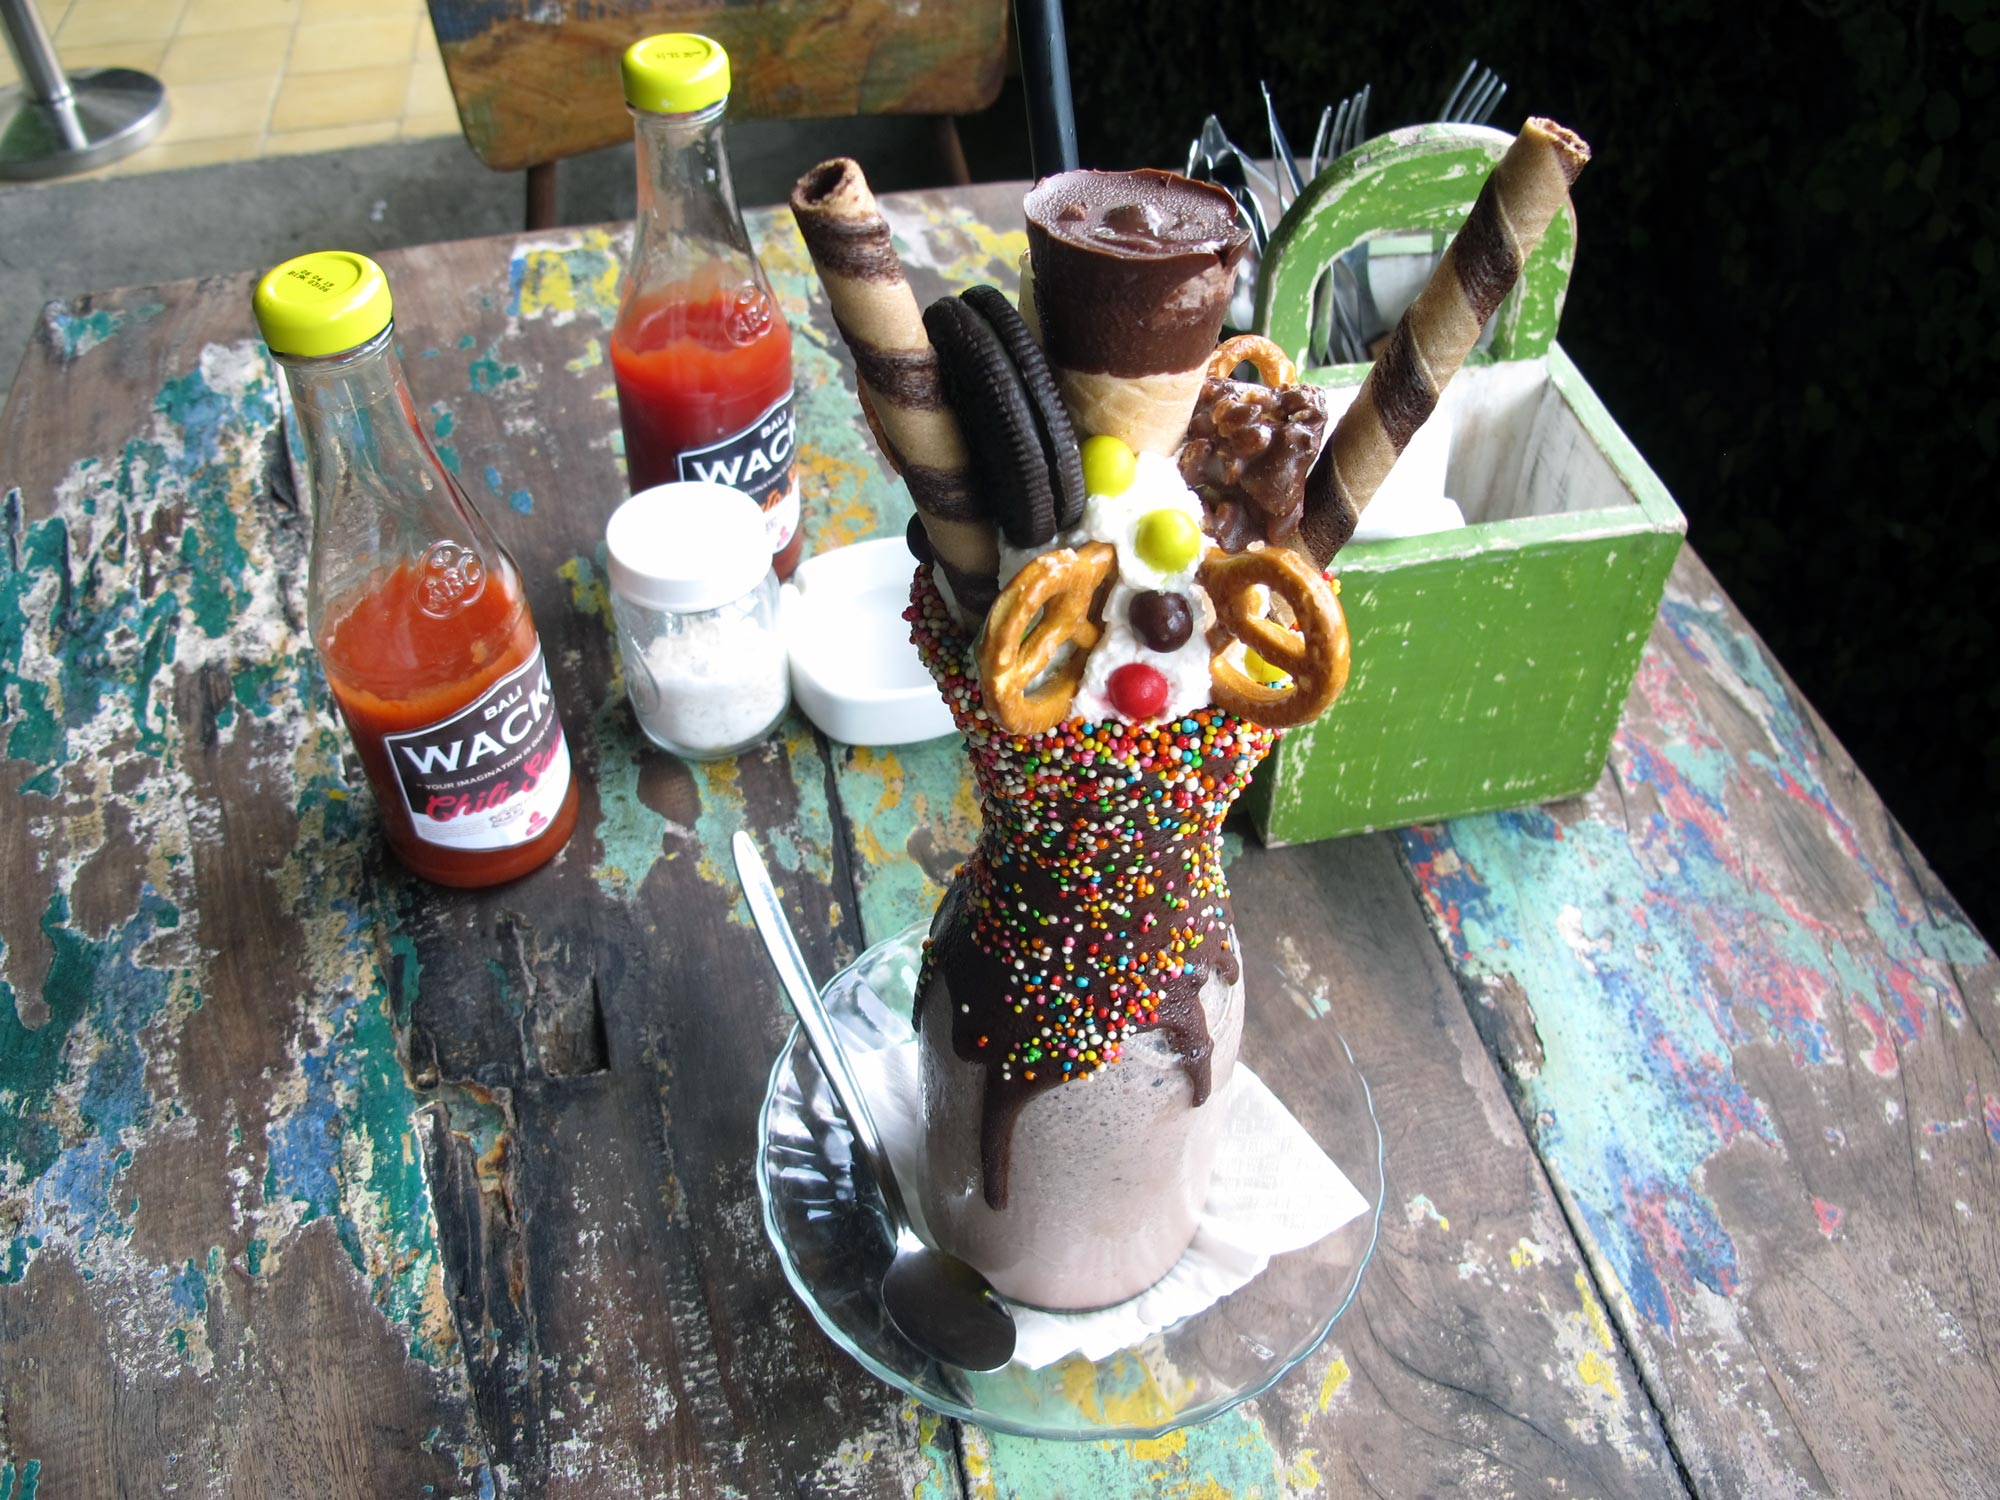 Milkshake gigante al Wacko Burger Cafe (Photo by Gabriele Ferrando)